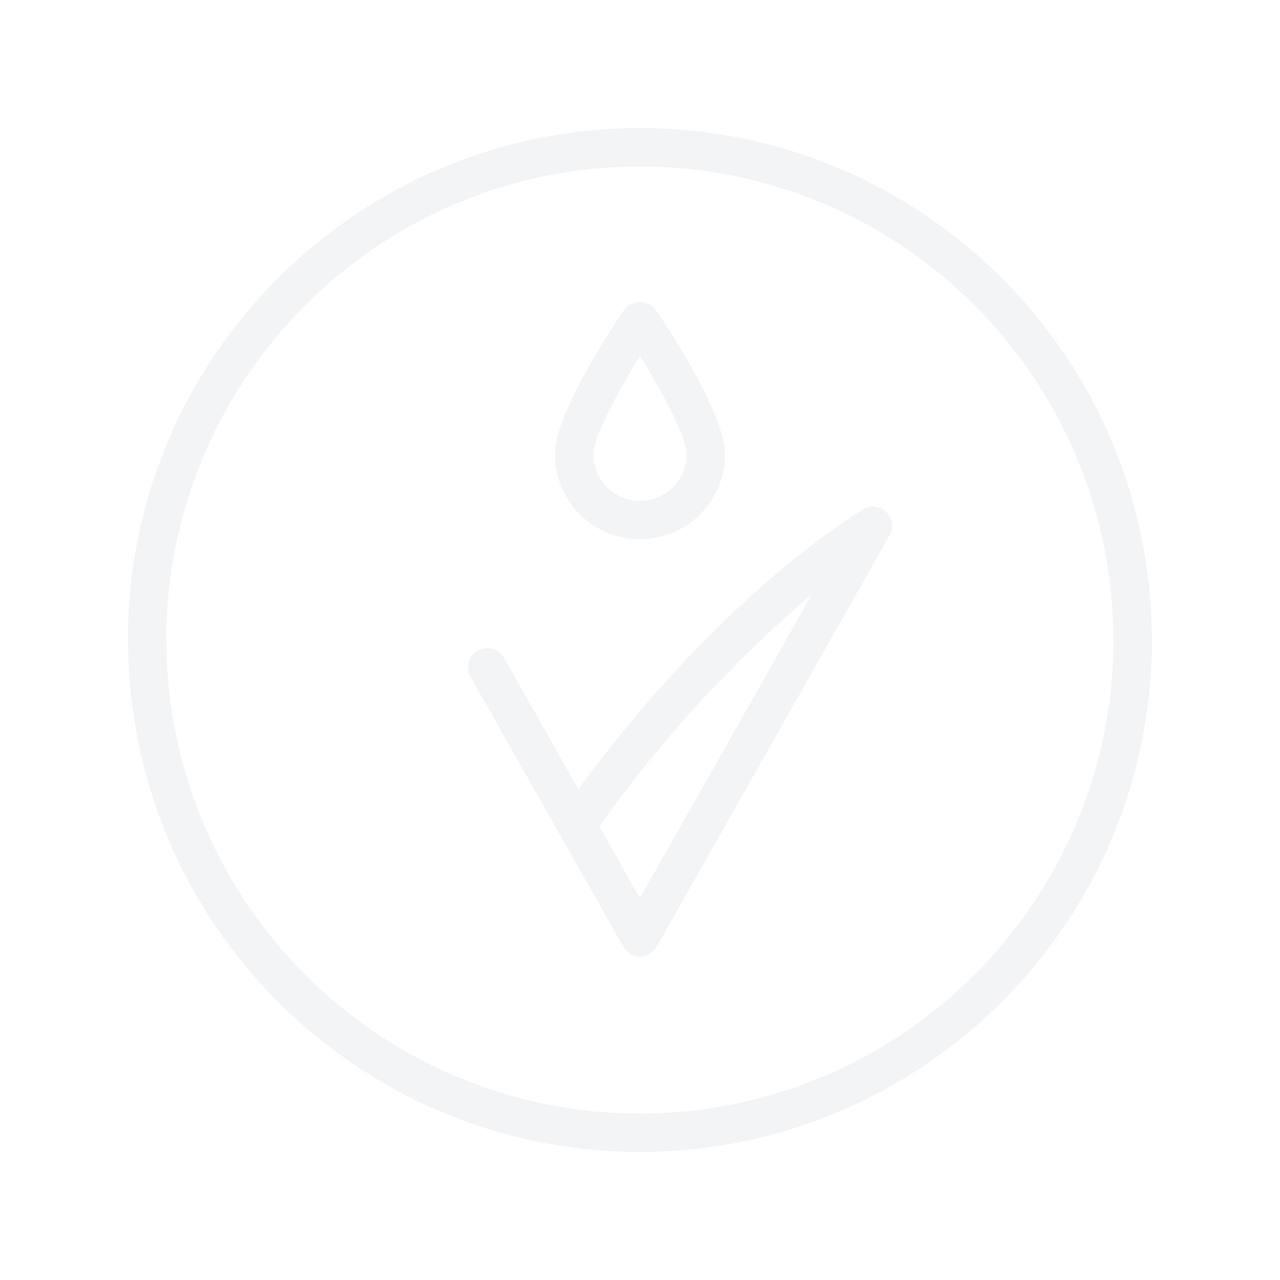 IDUN MINERALS Cleansing Face & Eye Lotion очищающий лосьон для лица и глаз150ml